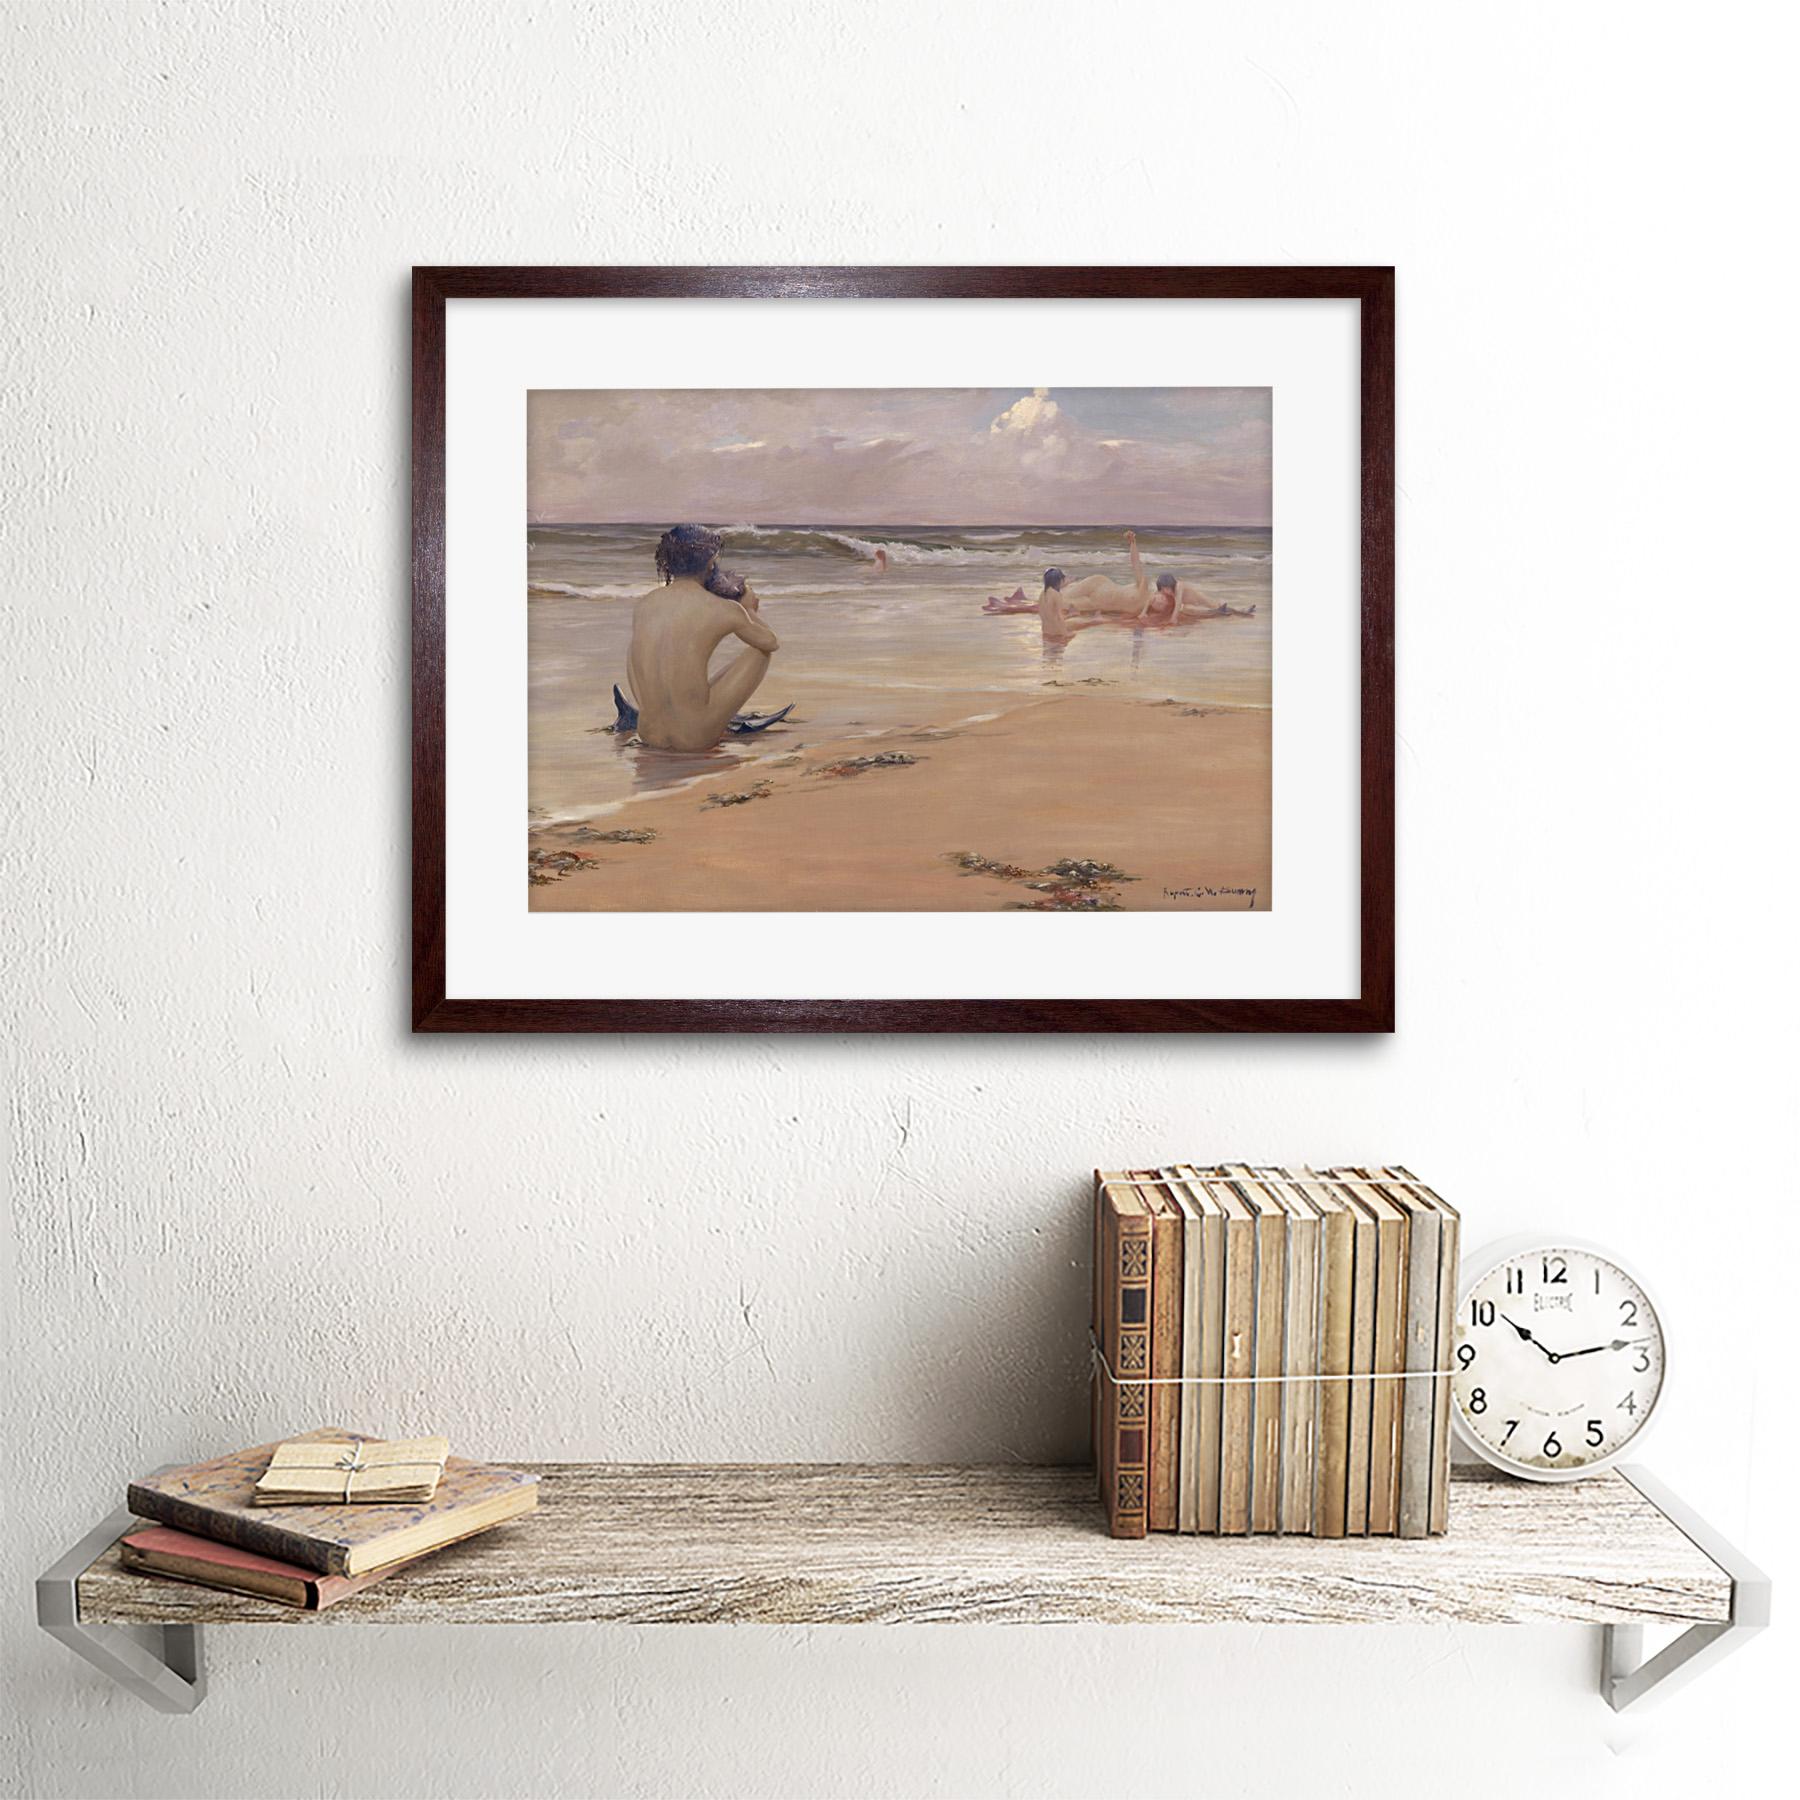 thumbnail 8 - Rupert Bunny Sea Idyll 1891 Old Painting Framed Art Print 12x16 Inch